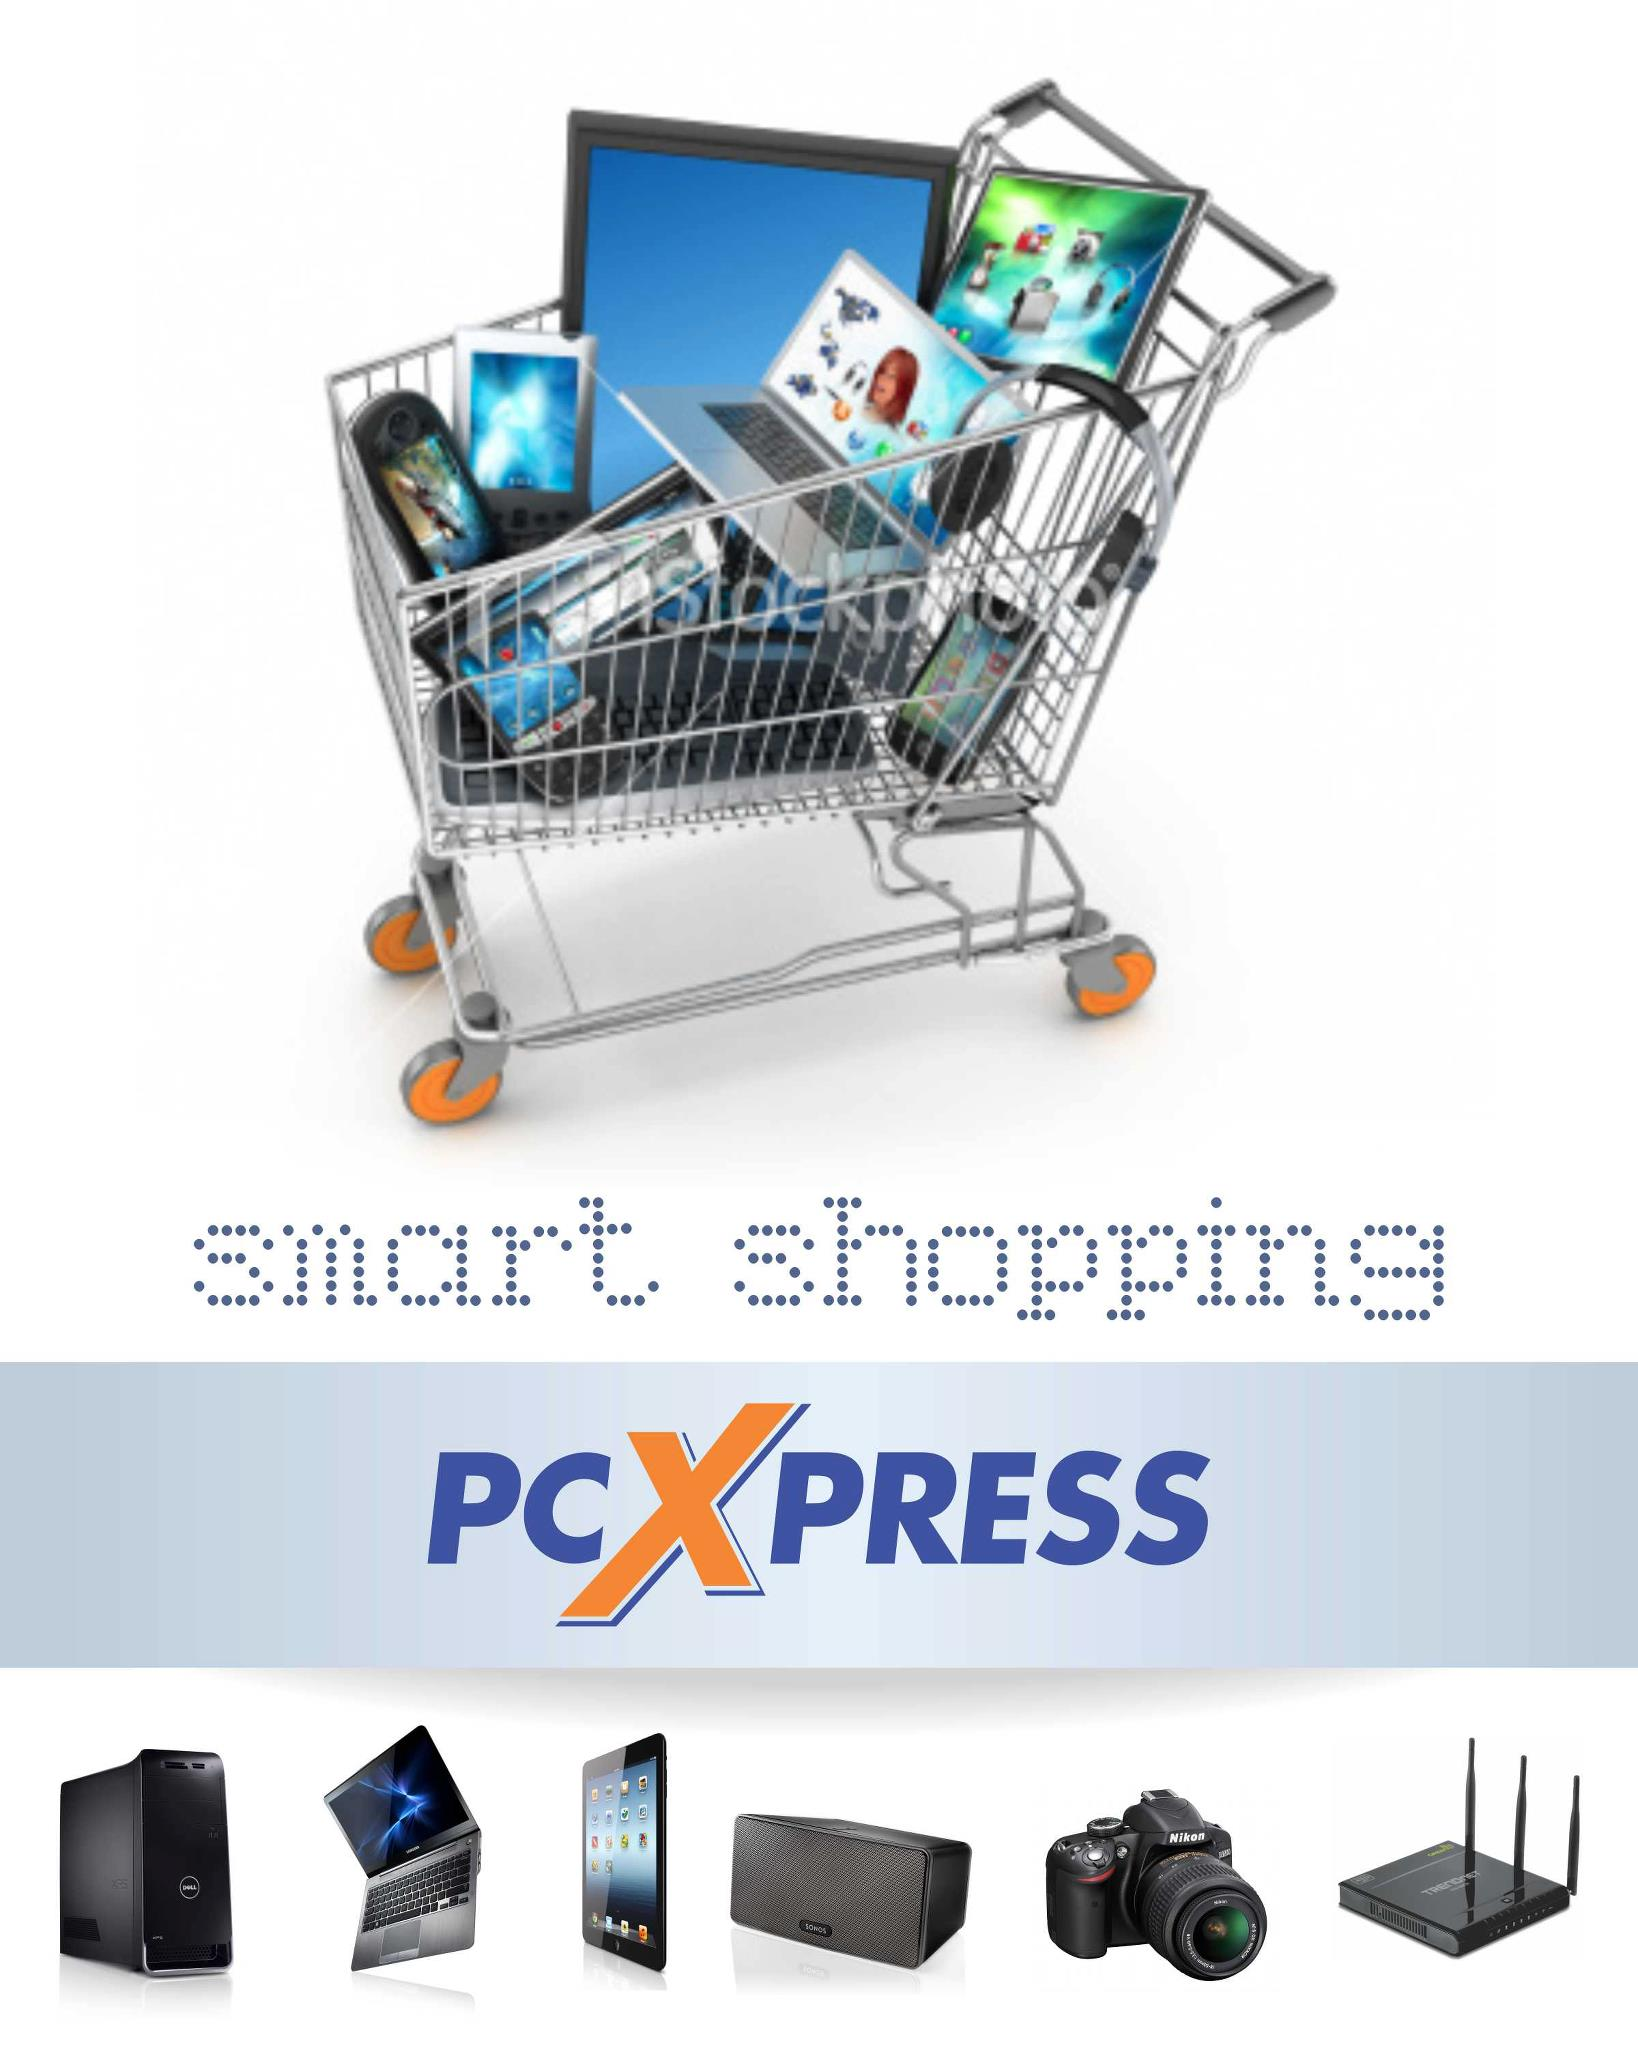 Pc Express / PcXpress